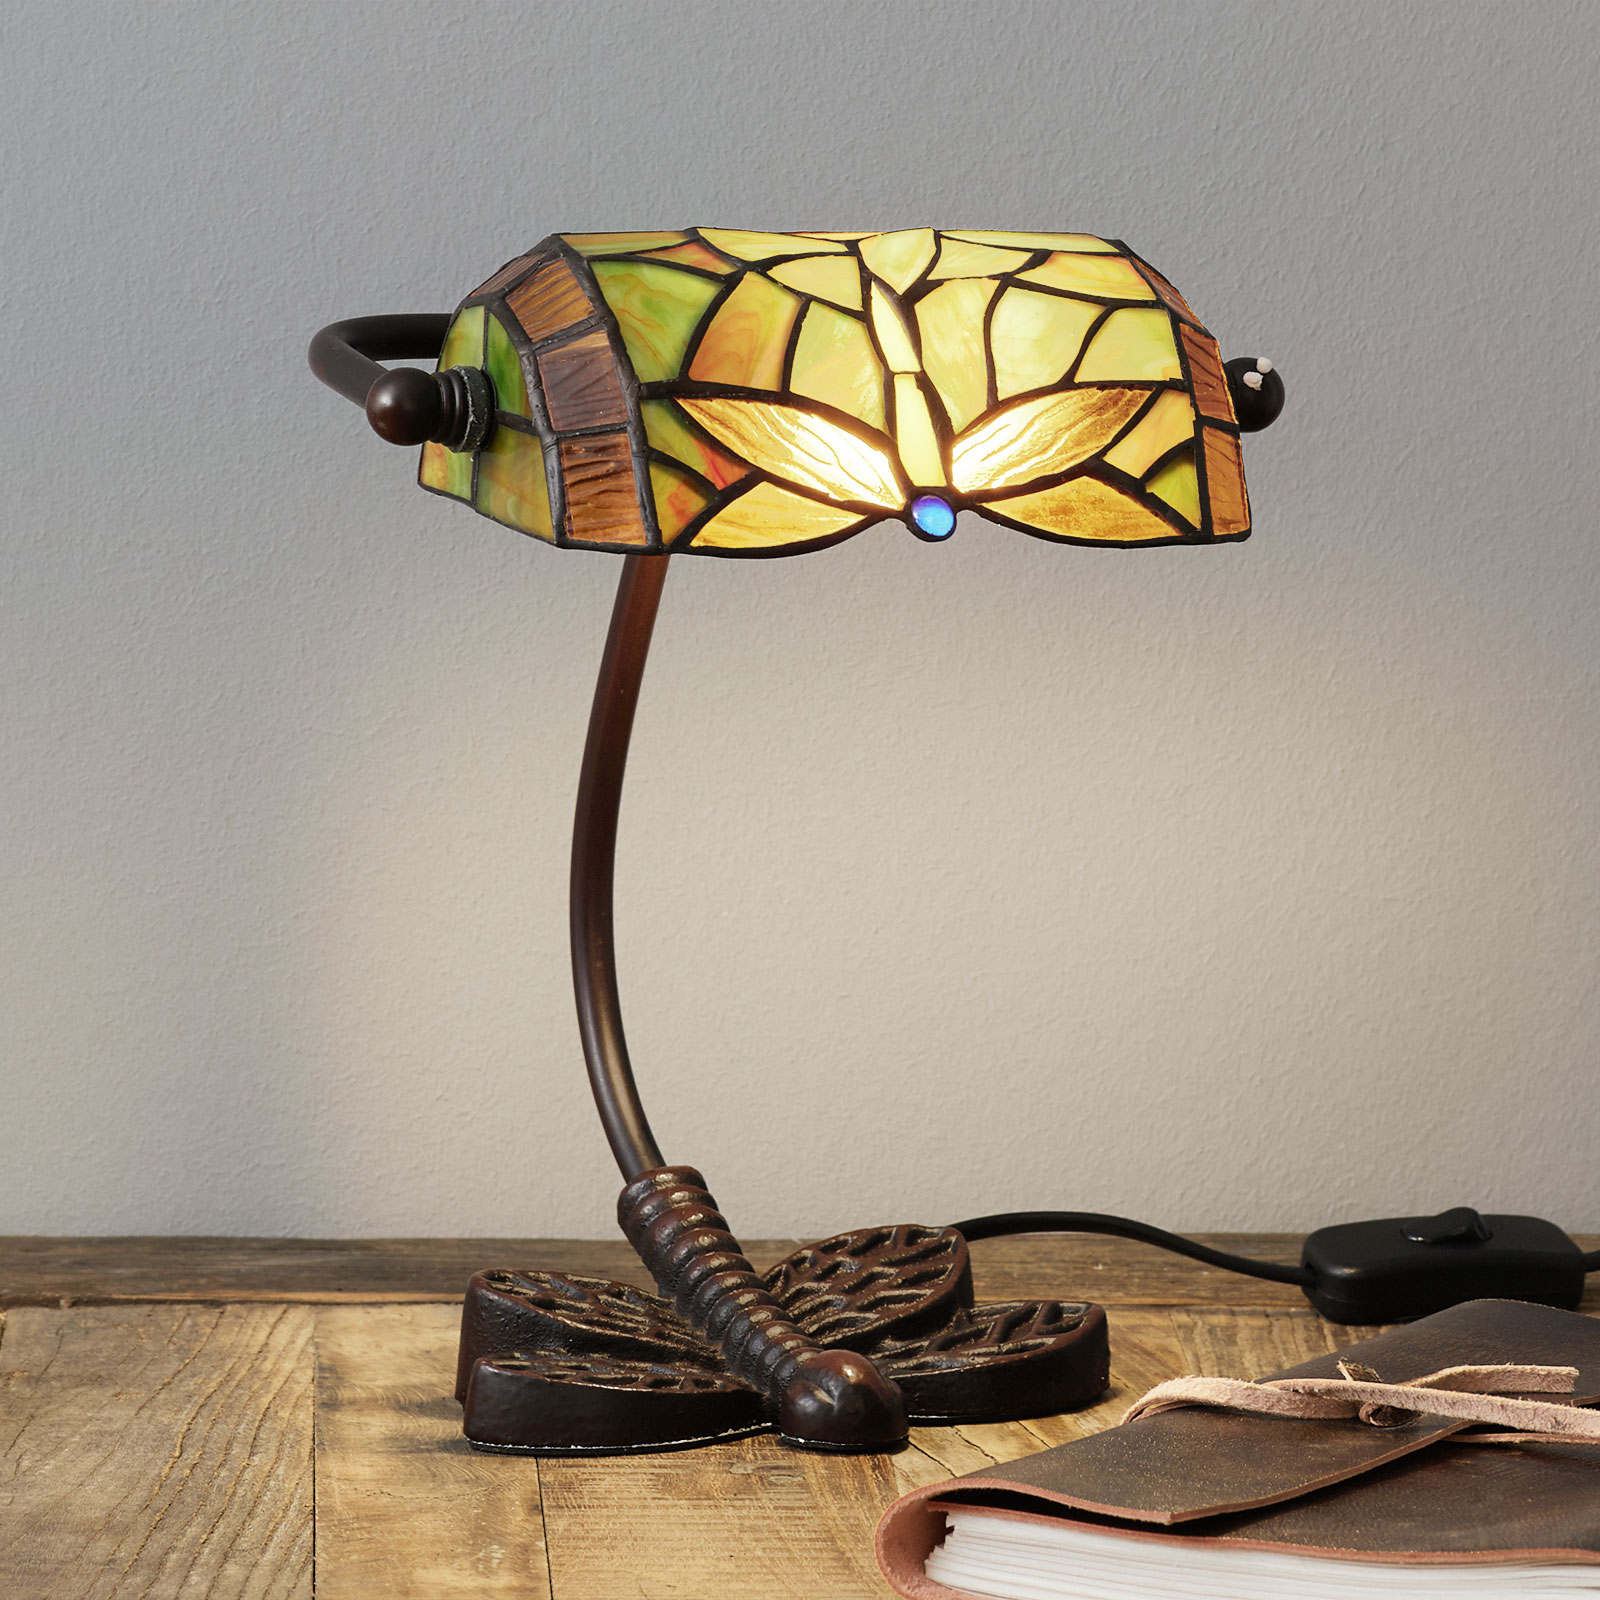 Lámpara de mesa famosa DRAGONFLY, hecha a mano